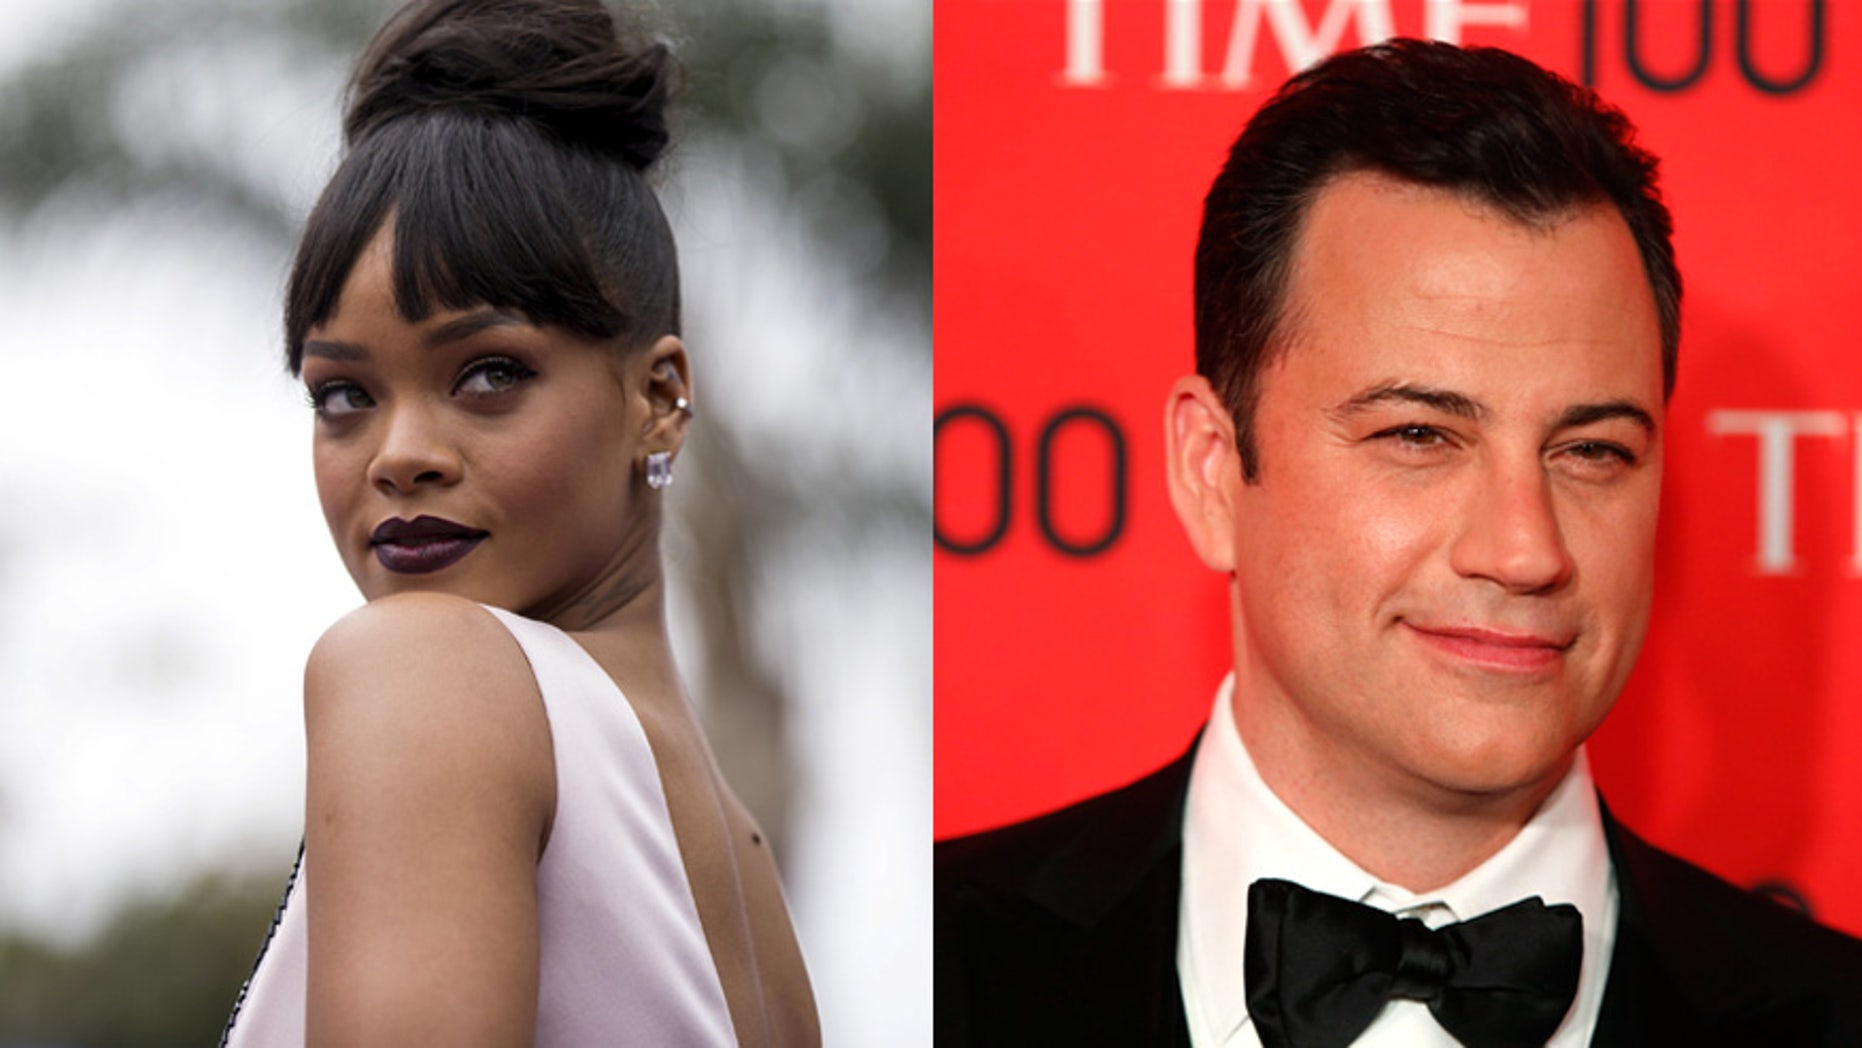 Rihanna, left, surprised Jimmy Kimmel for April Fools' Day.